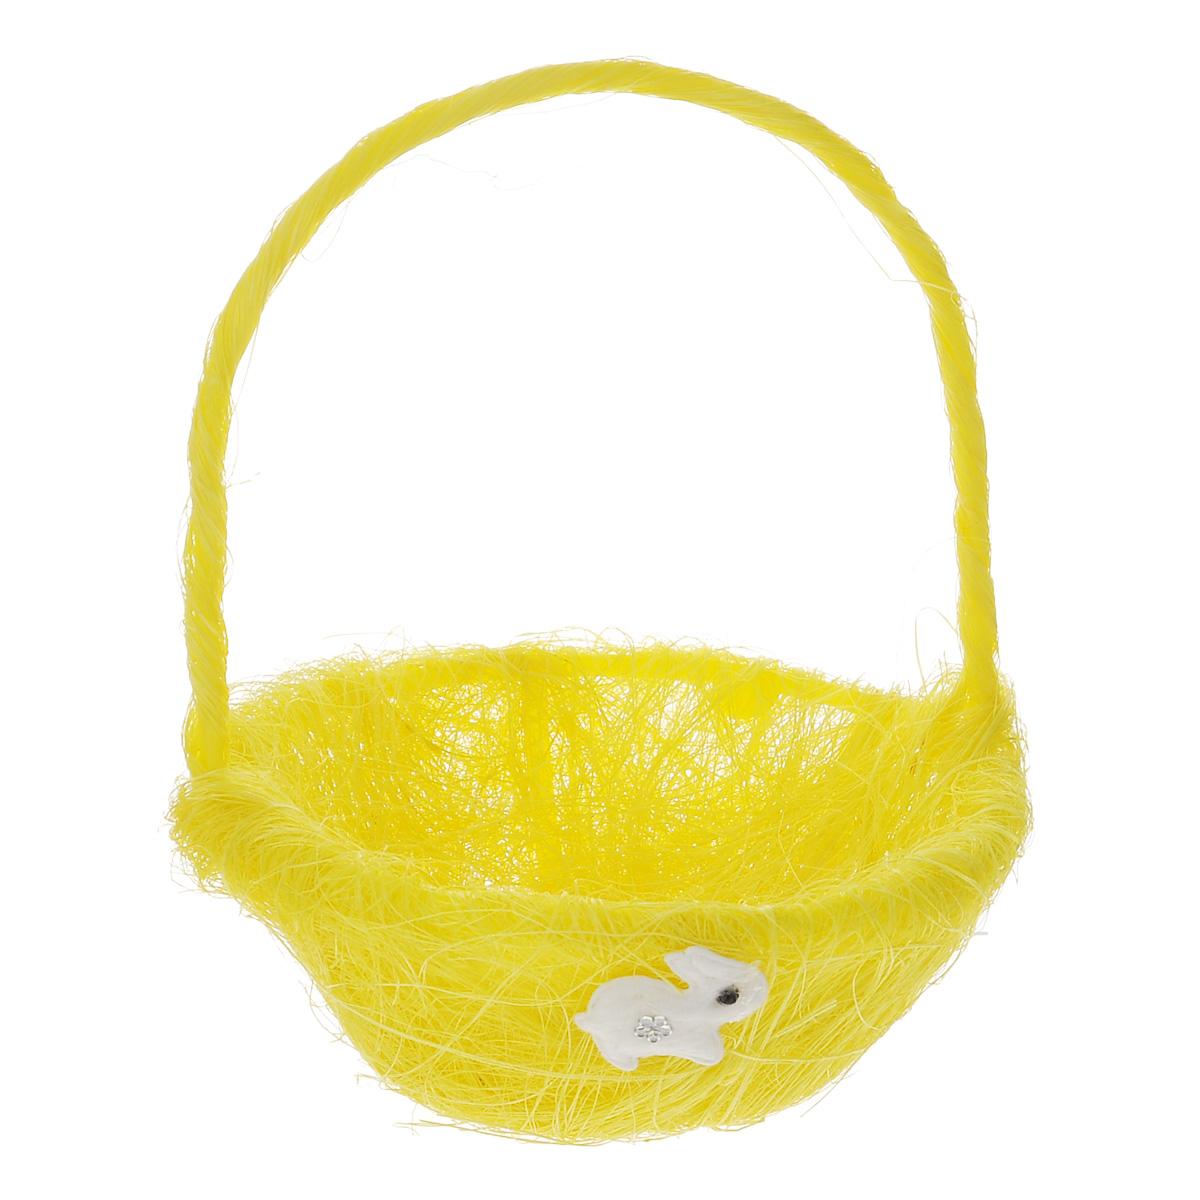 Корзинка декоративная Home Queen Легкость, цвет: желтый, 14,5 х 19 см мочалка из нейлона home queen цвет желтый 57199